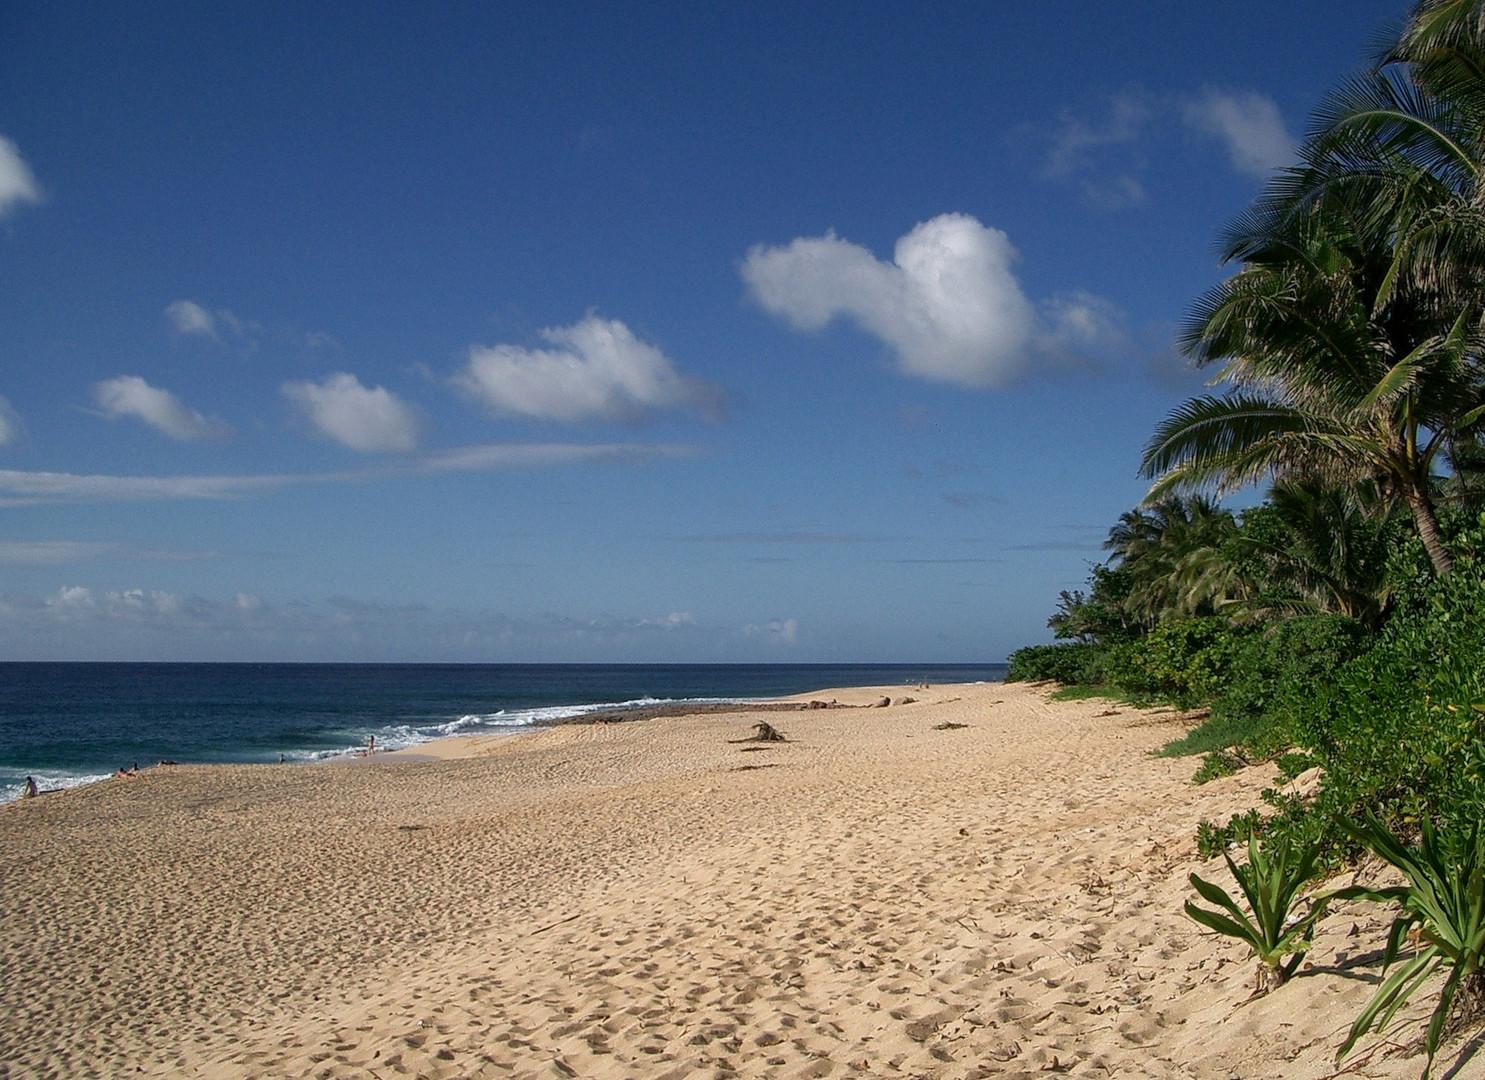 Hawai O'ahu - Nordstrand